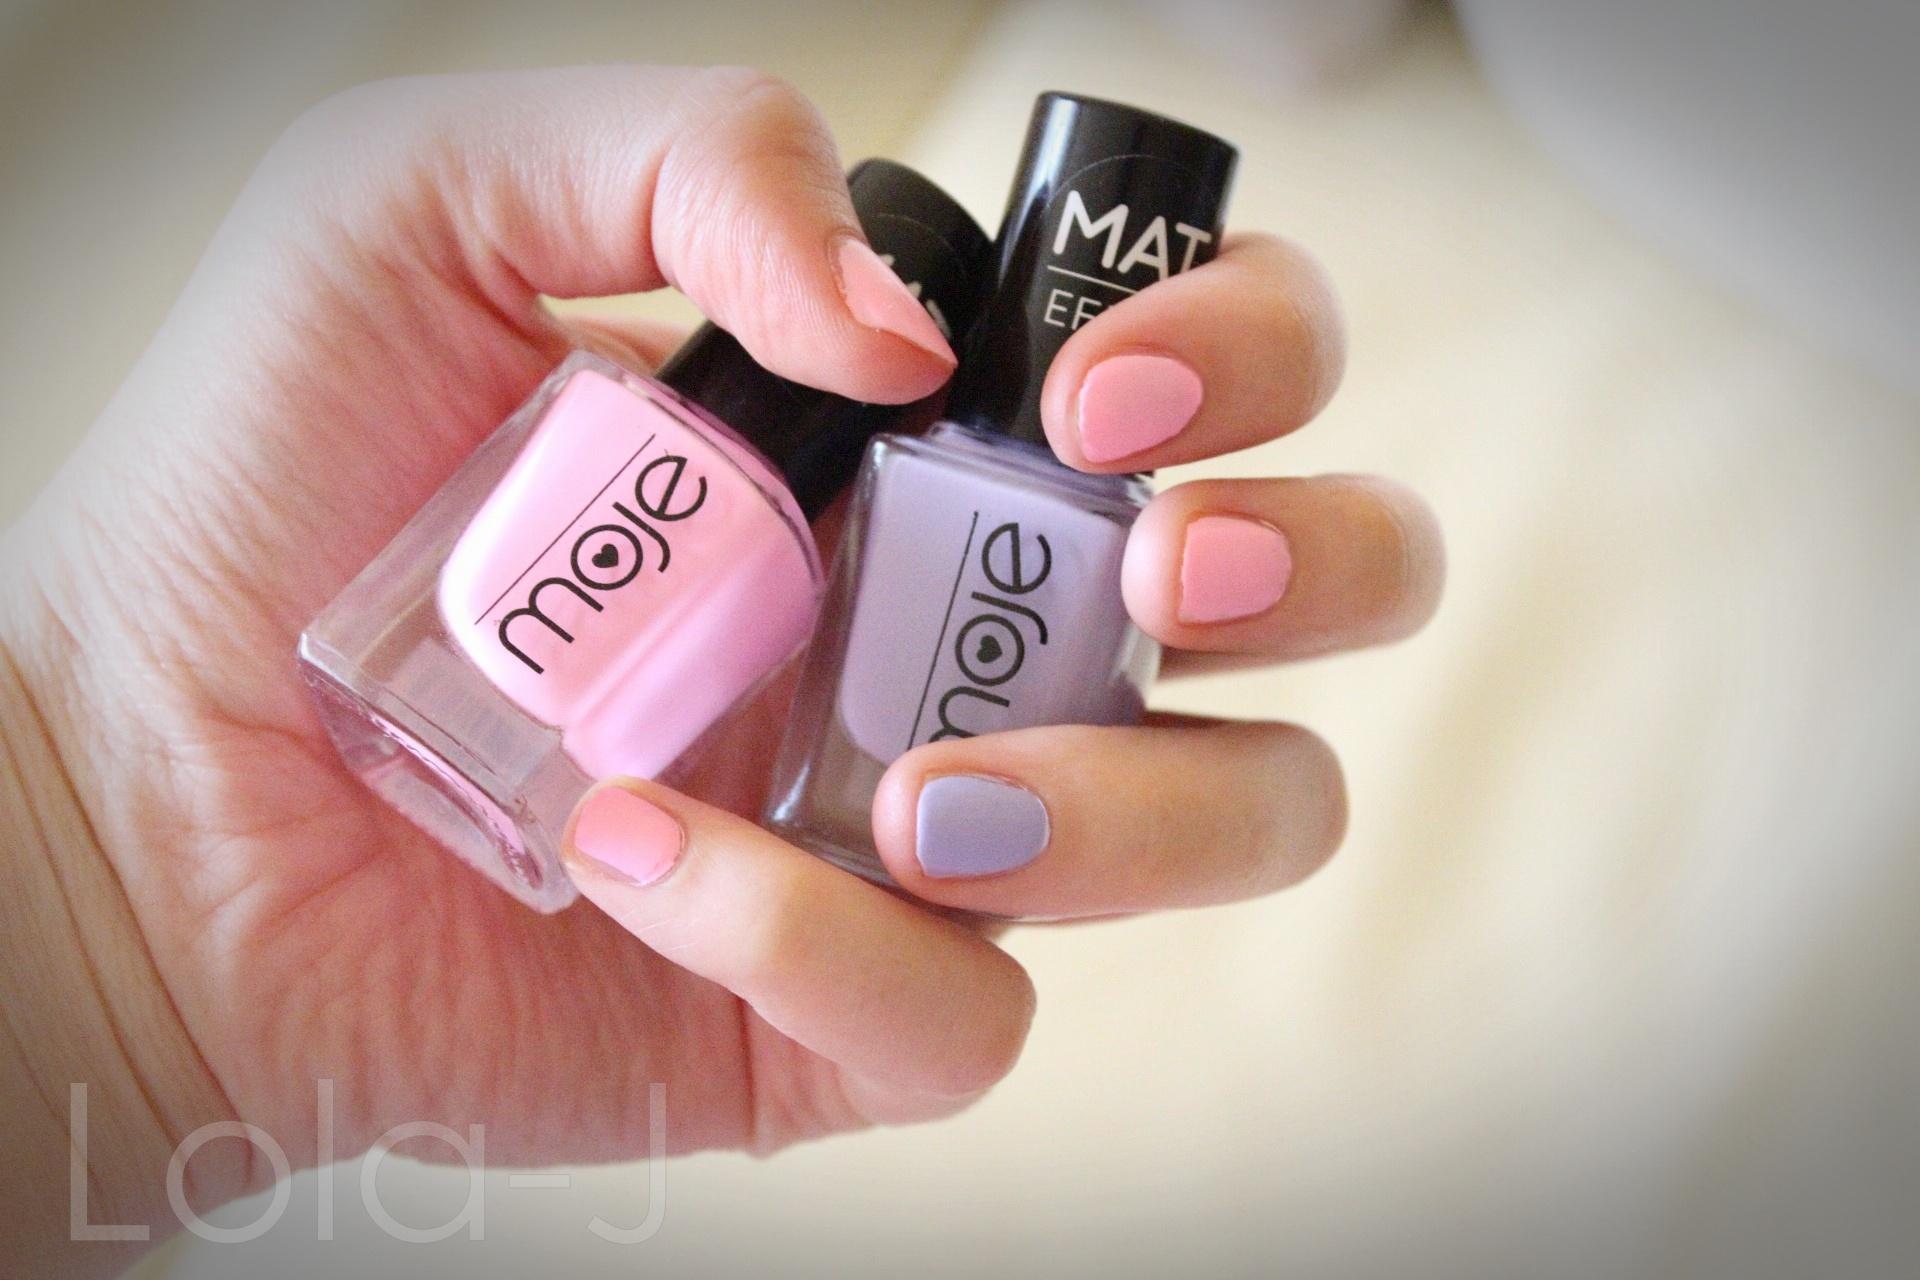 Nove Laky Na Nehty Mat Efekt Kosmetika Moje Lola J